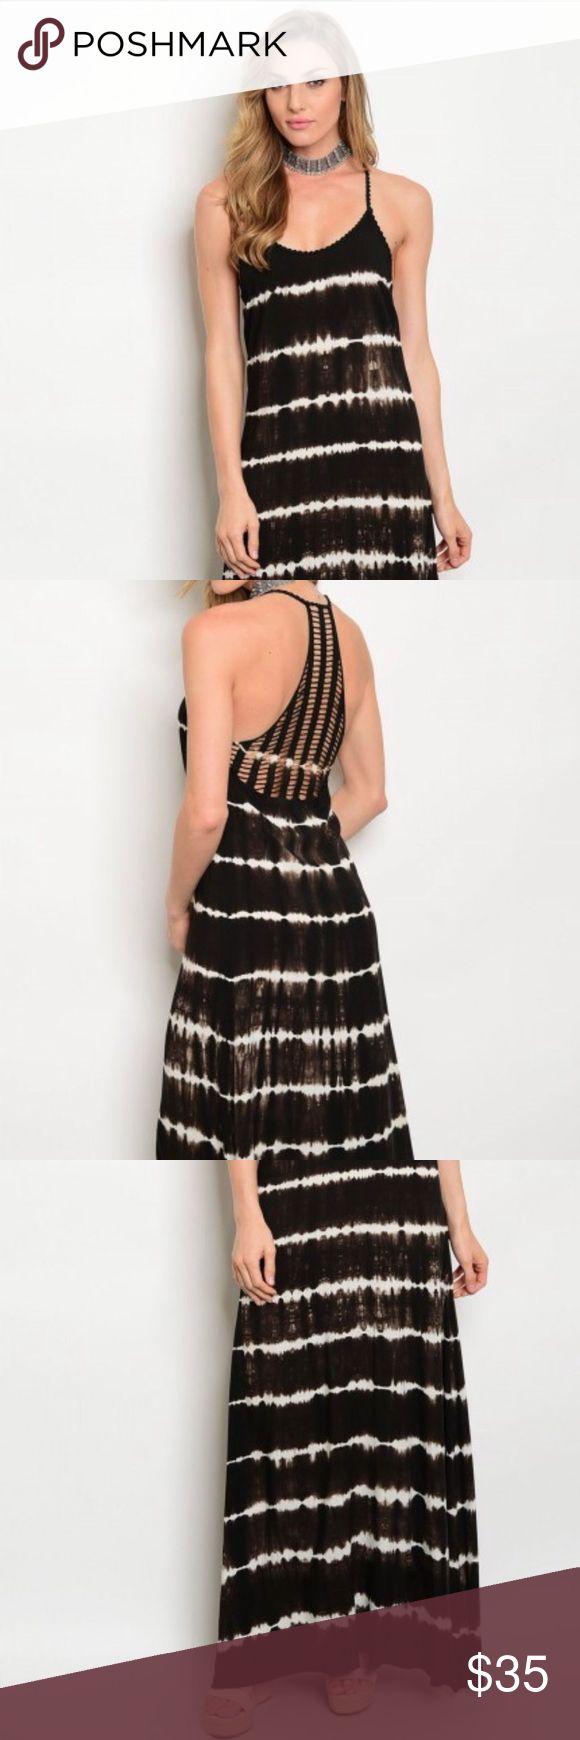 Scoop neck striped tie dye maxi dress Scoop neck striped tie dye maxi dress. Dresses Maxi